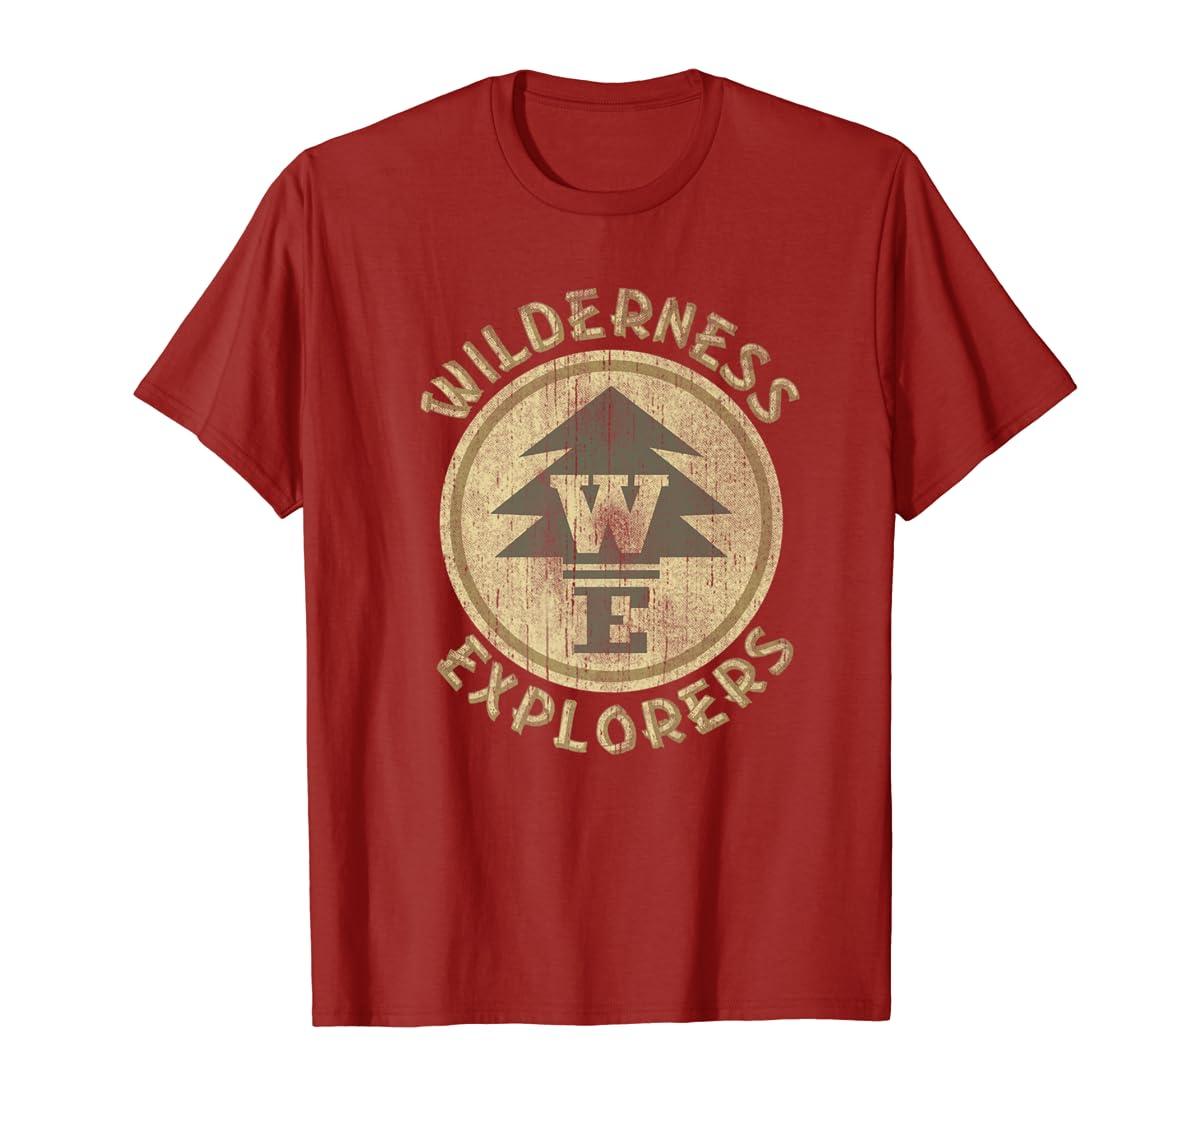 Disney Pixar Up Wilderness Explorer Badge Premium T-Shirt-Men's T-Shirt-Red